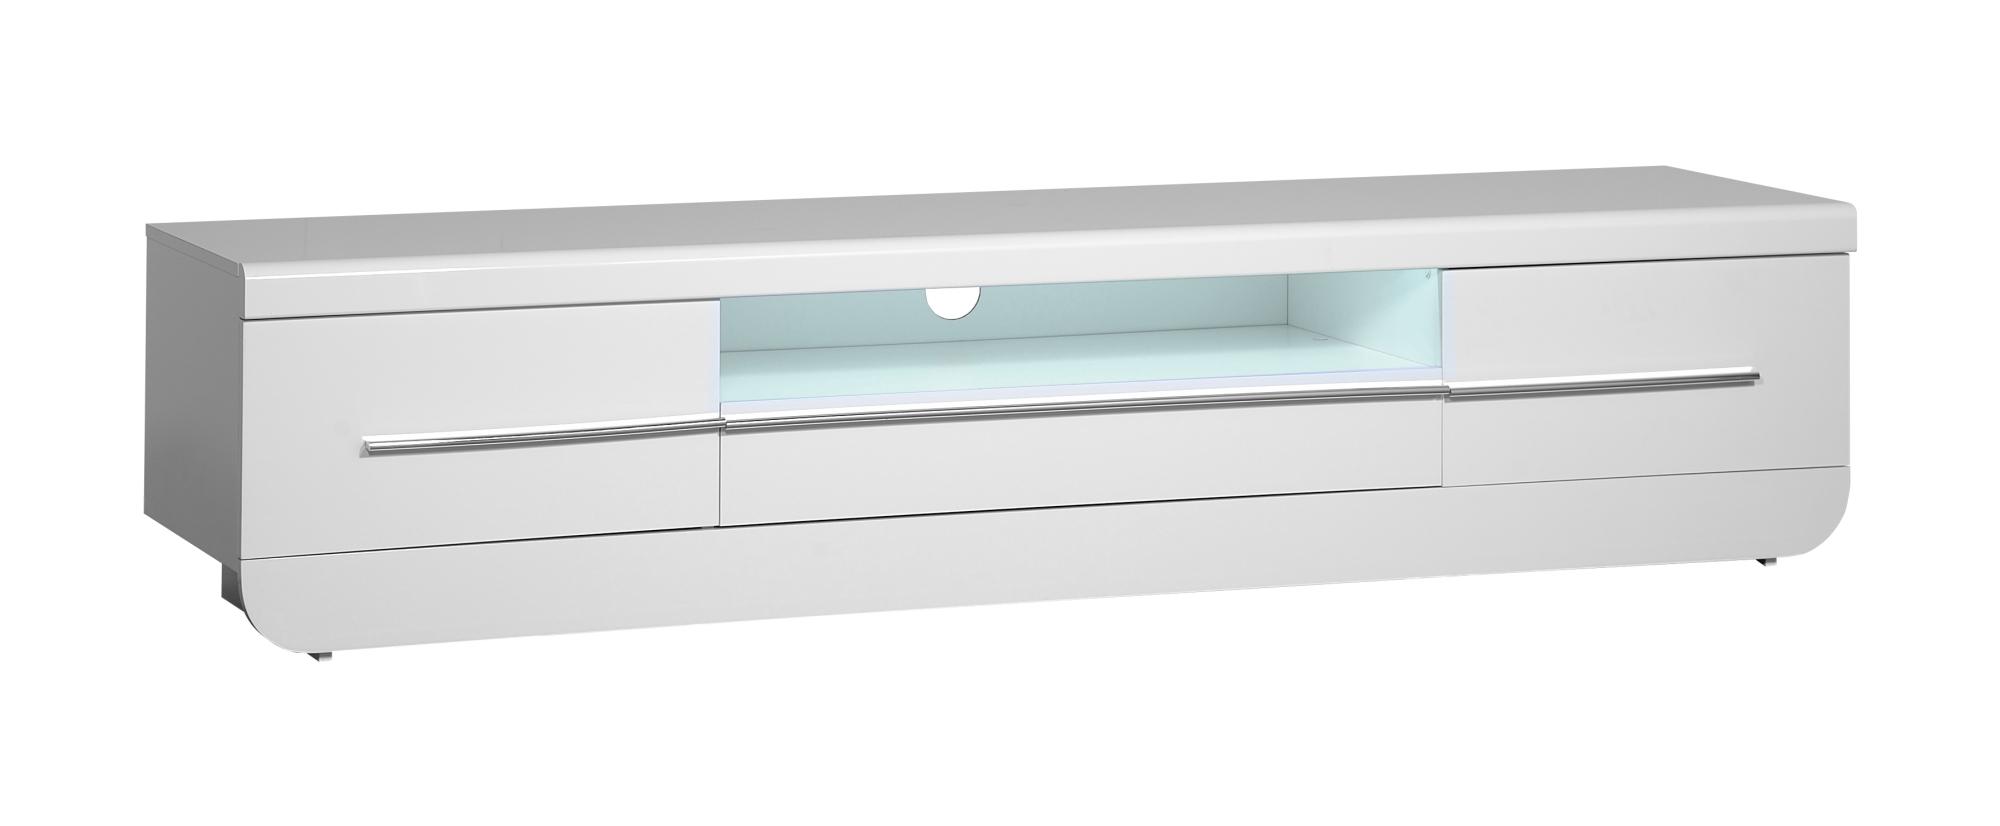 design tv hifi ablage unterschrank lowboard led mod sc072 weiss hochglanz lack ebay. Black Bedroom Furniture Sets. Home Design Ideas